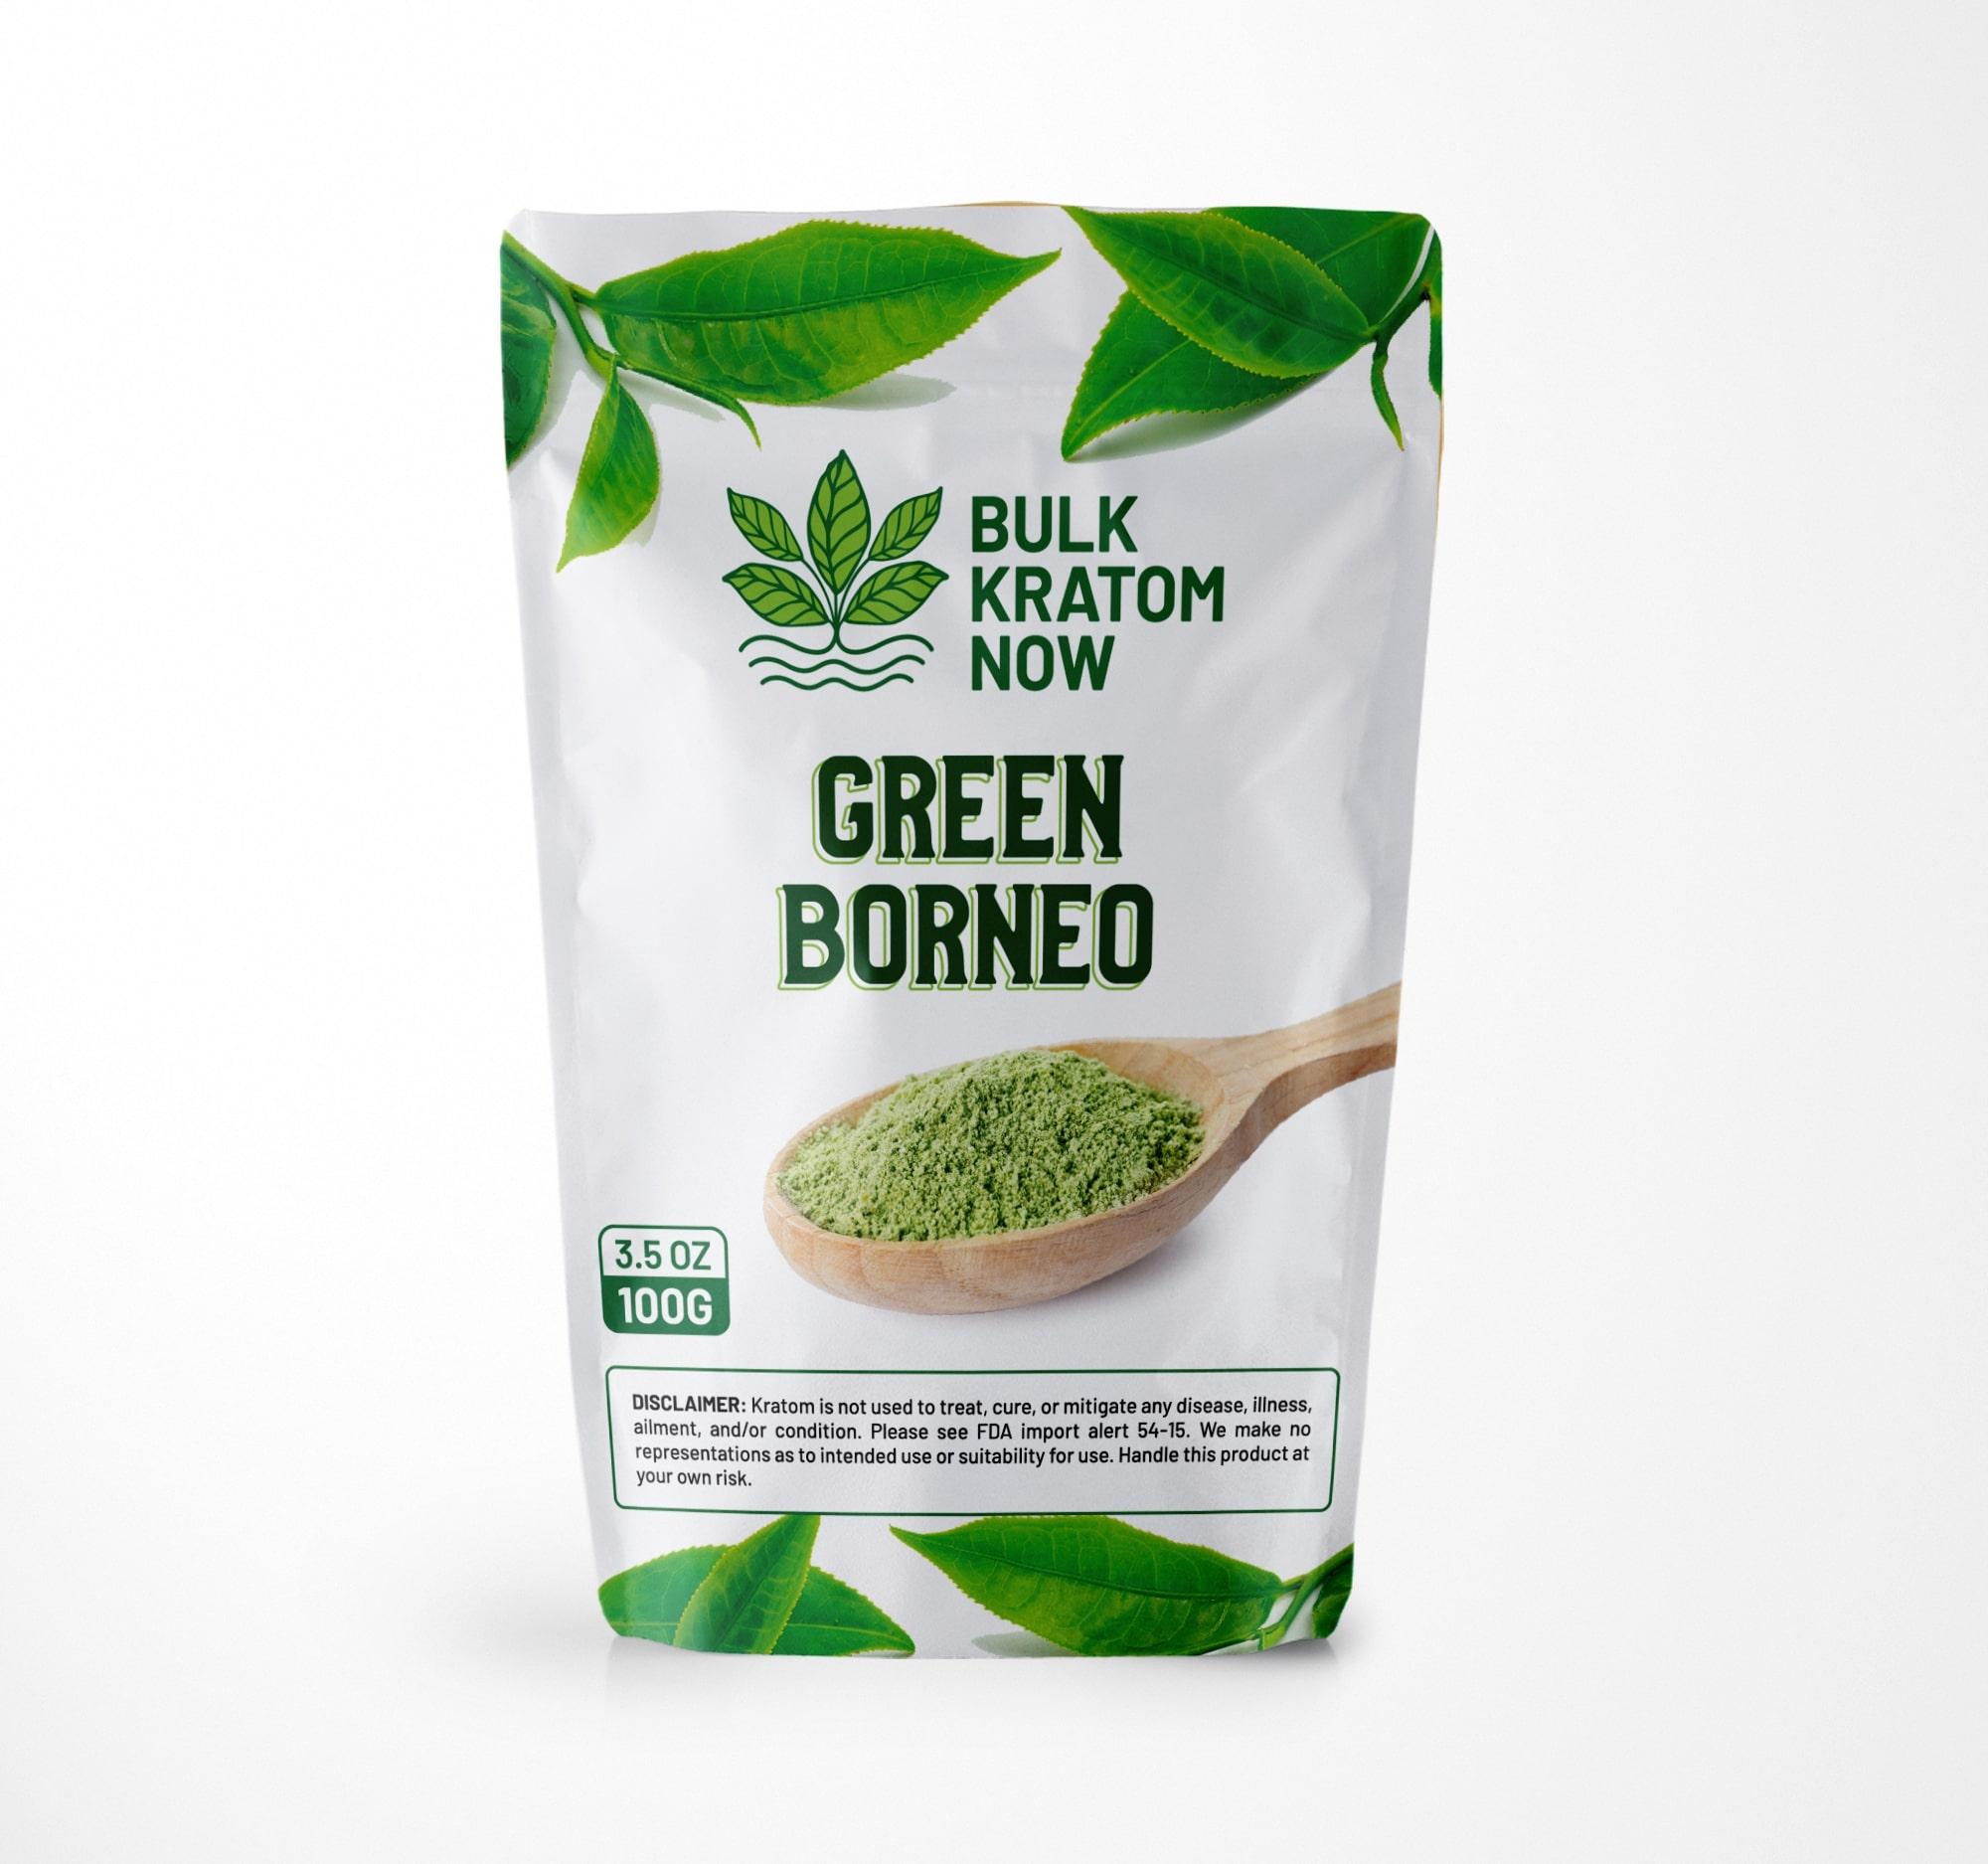 Green Borneo Bulk Kratom